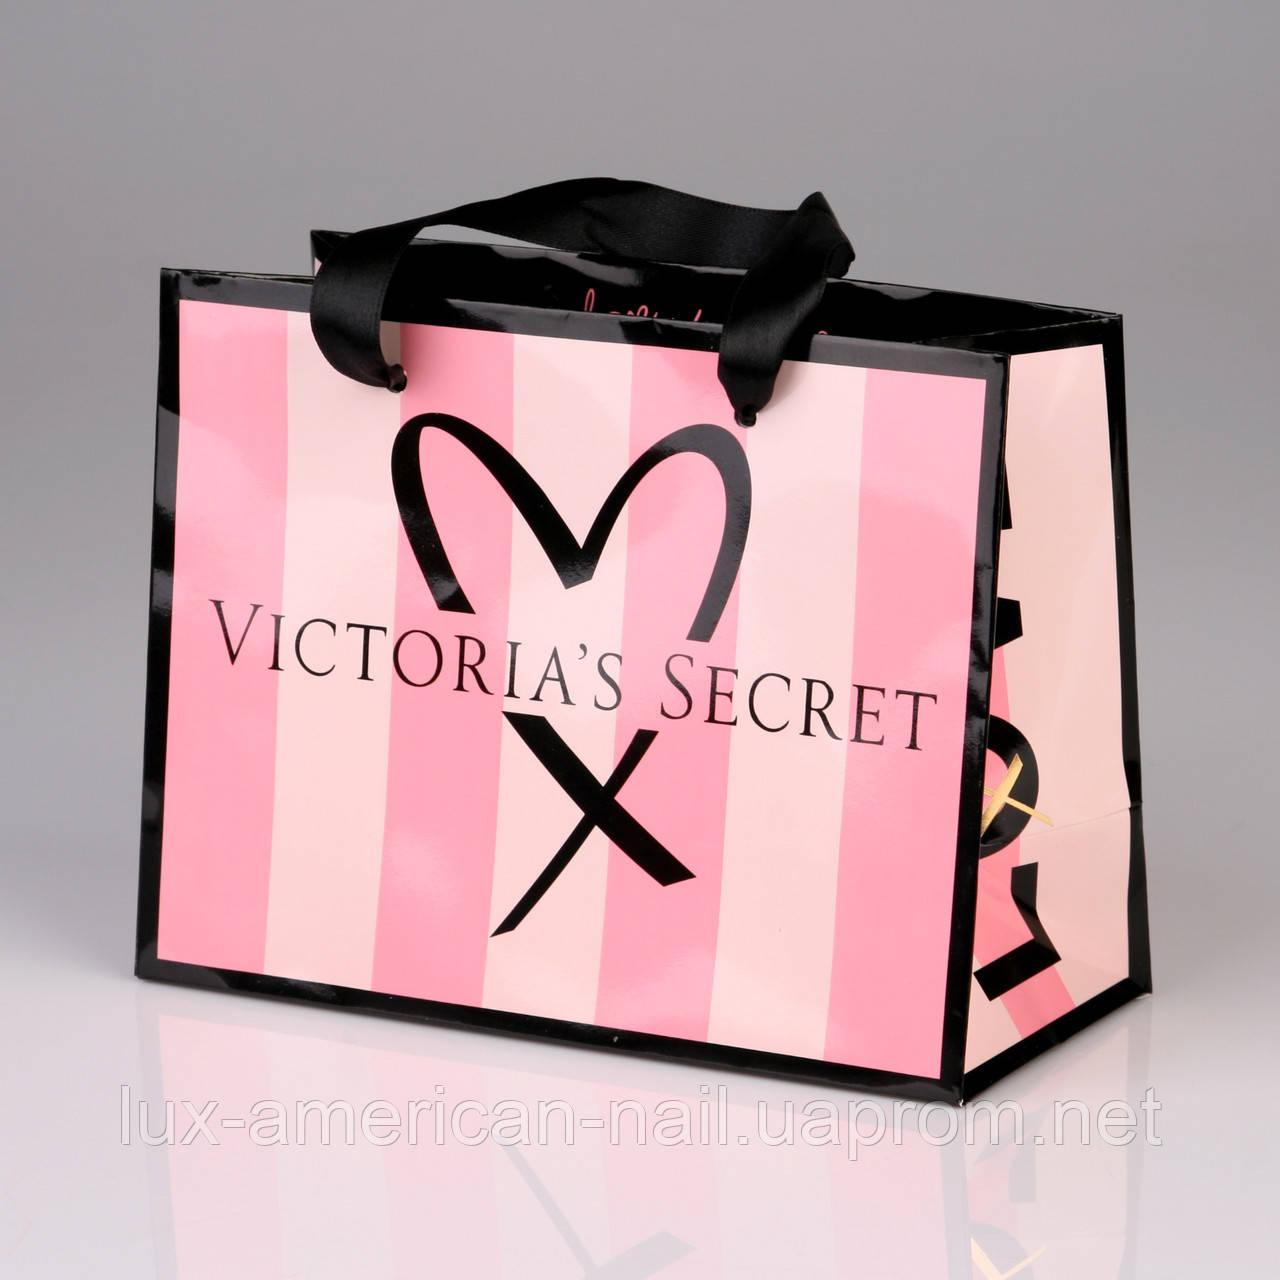 f73b88682abfb Подарочный пакет Victoria's secret , цена 55 грн., купить Київ — Prom.ua  (ID#796858625)